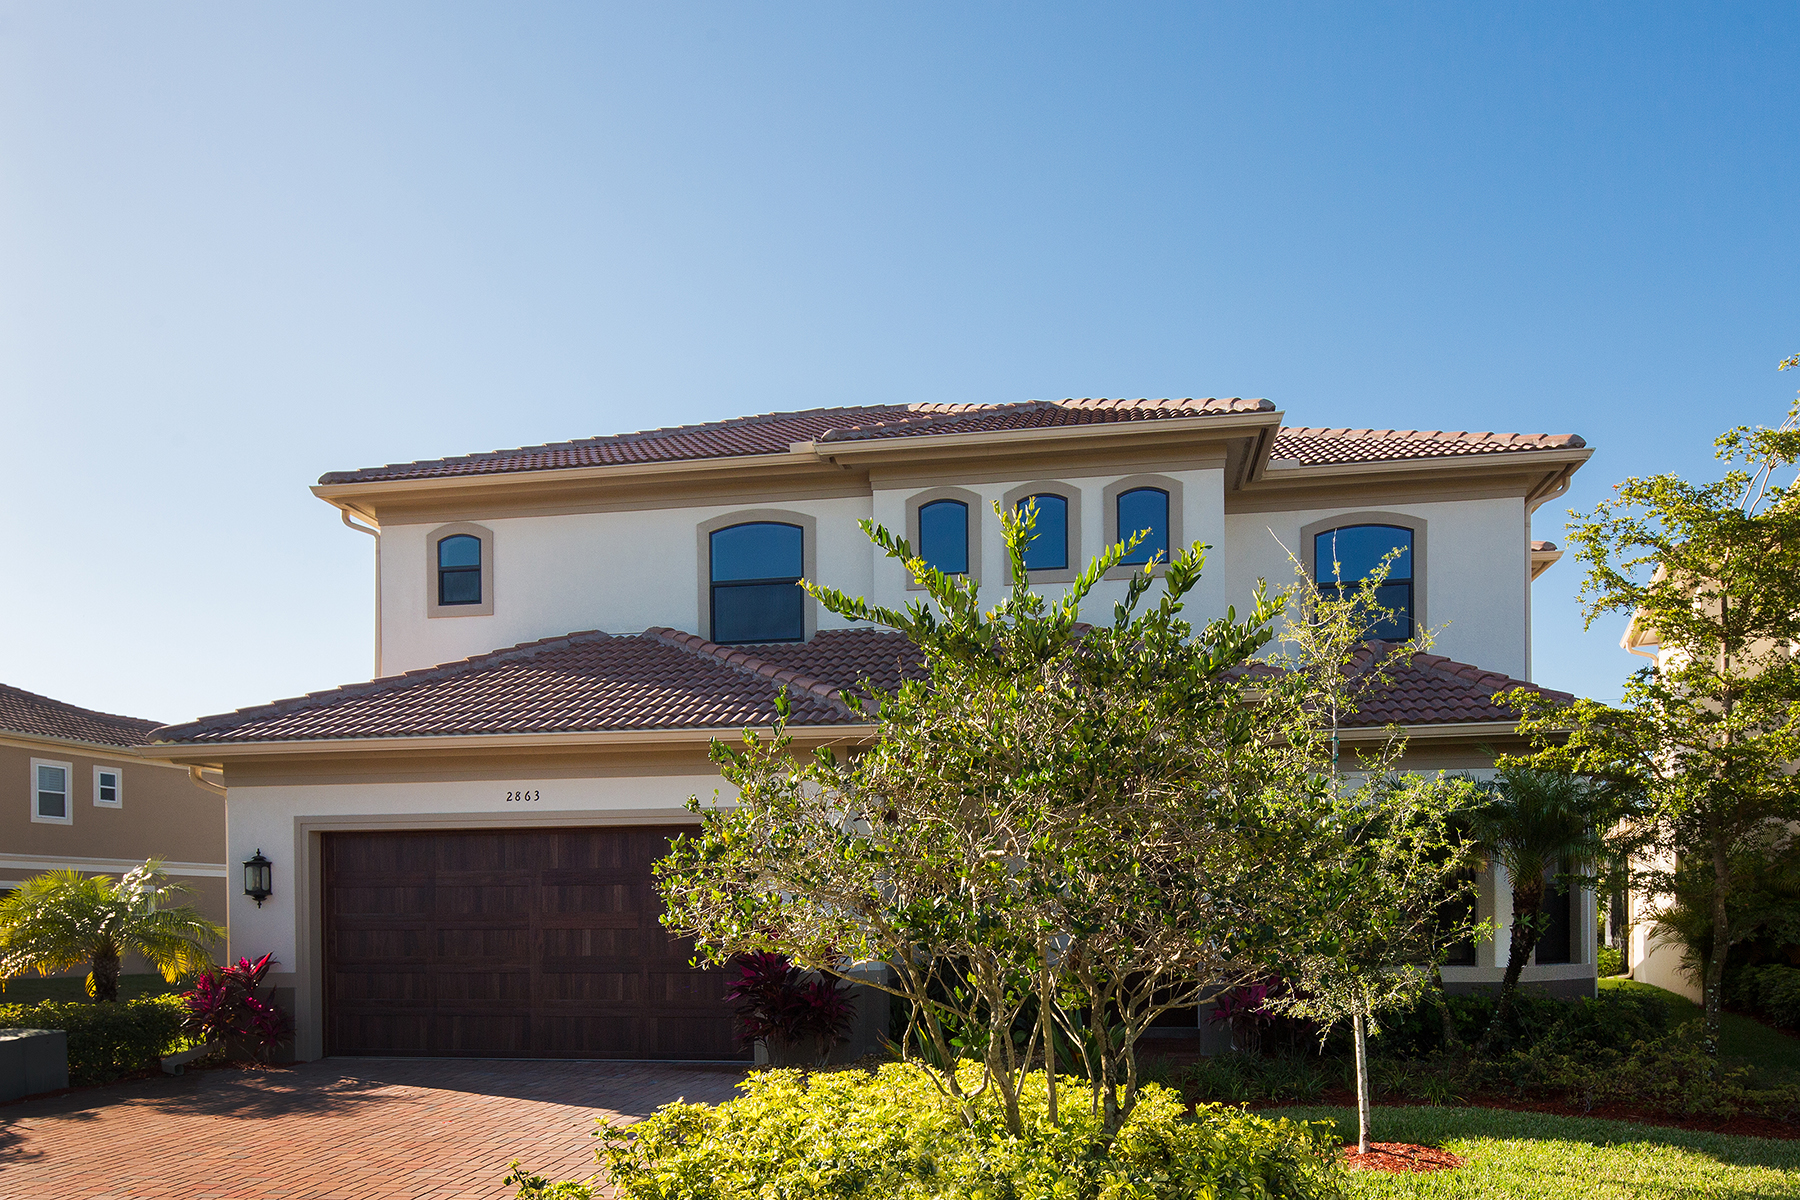 Nhà ở một gia đình vì Bán tại MONTEBELLO - COCO LAKES 2863 Coco Lakes Dr Naples, Florida, 34105 Hoa Kỳ